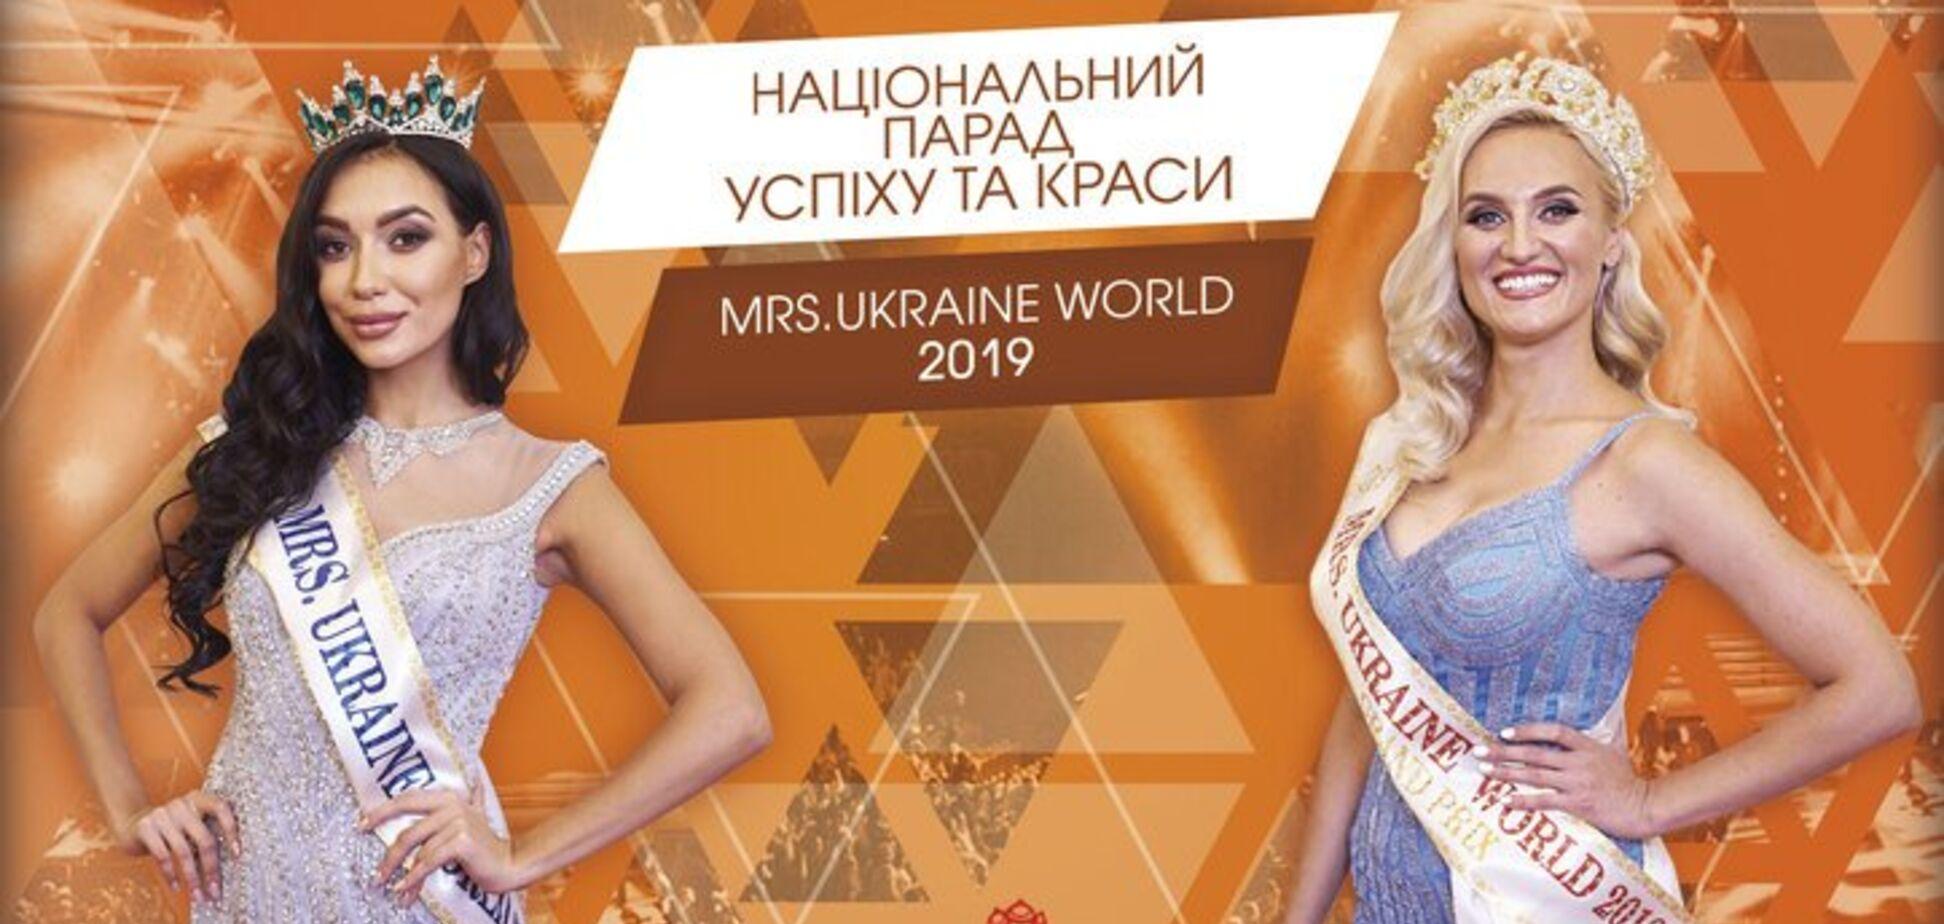 MRS. UKRAINE WORLD 2019: выбор Обозревателя